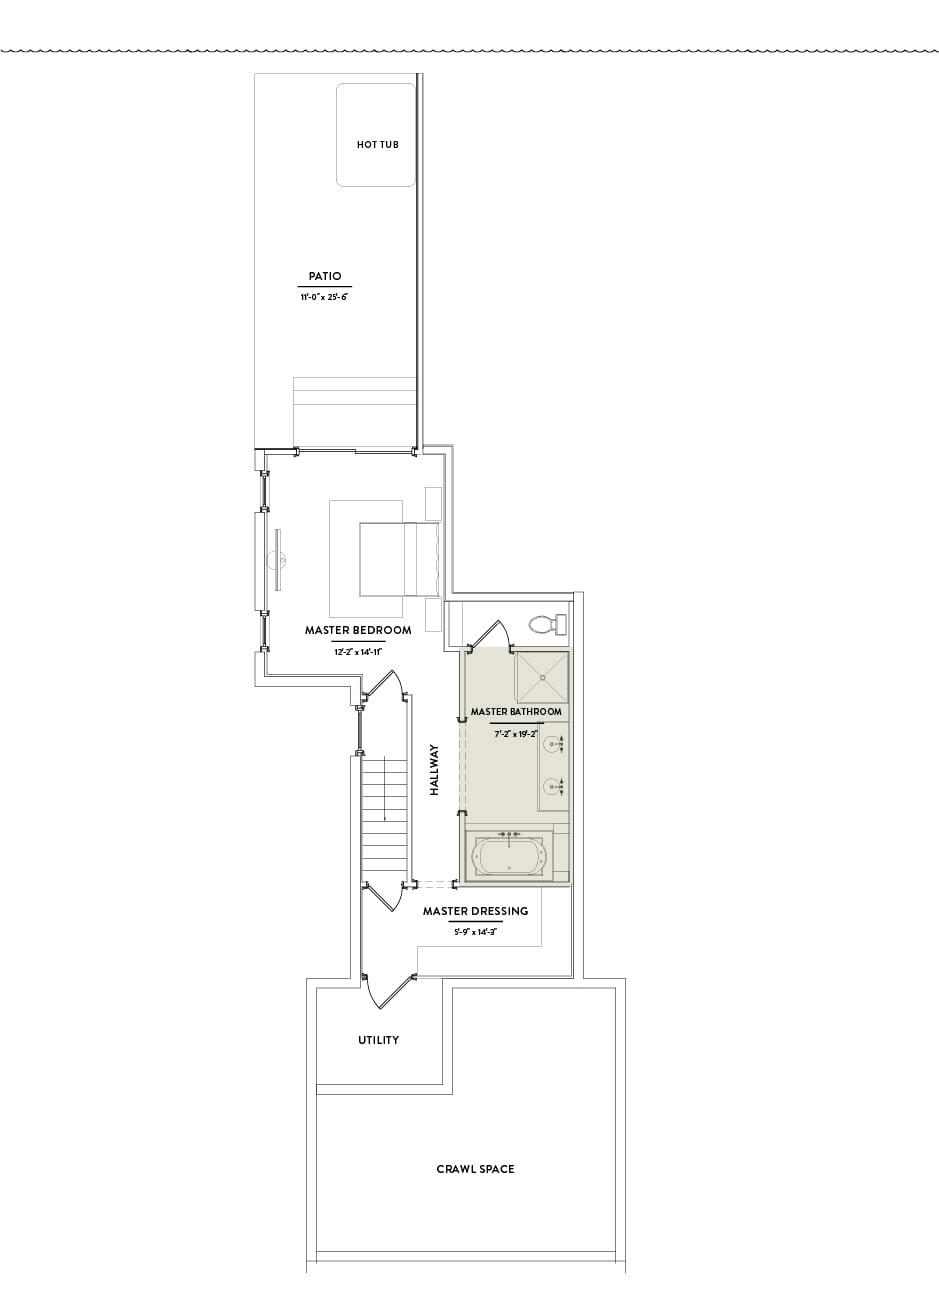 Hilltop 1 First Floor Master Bathroom